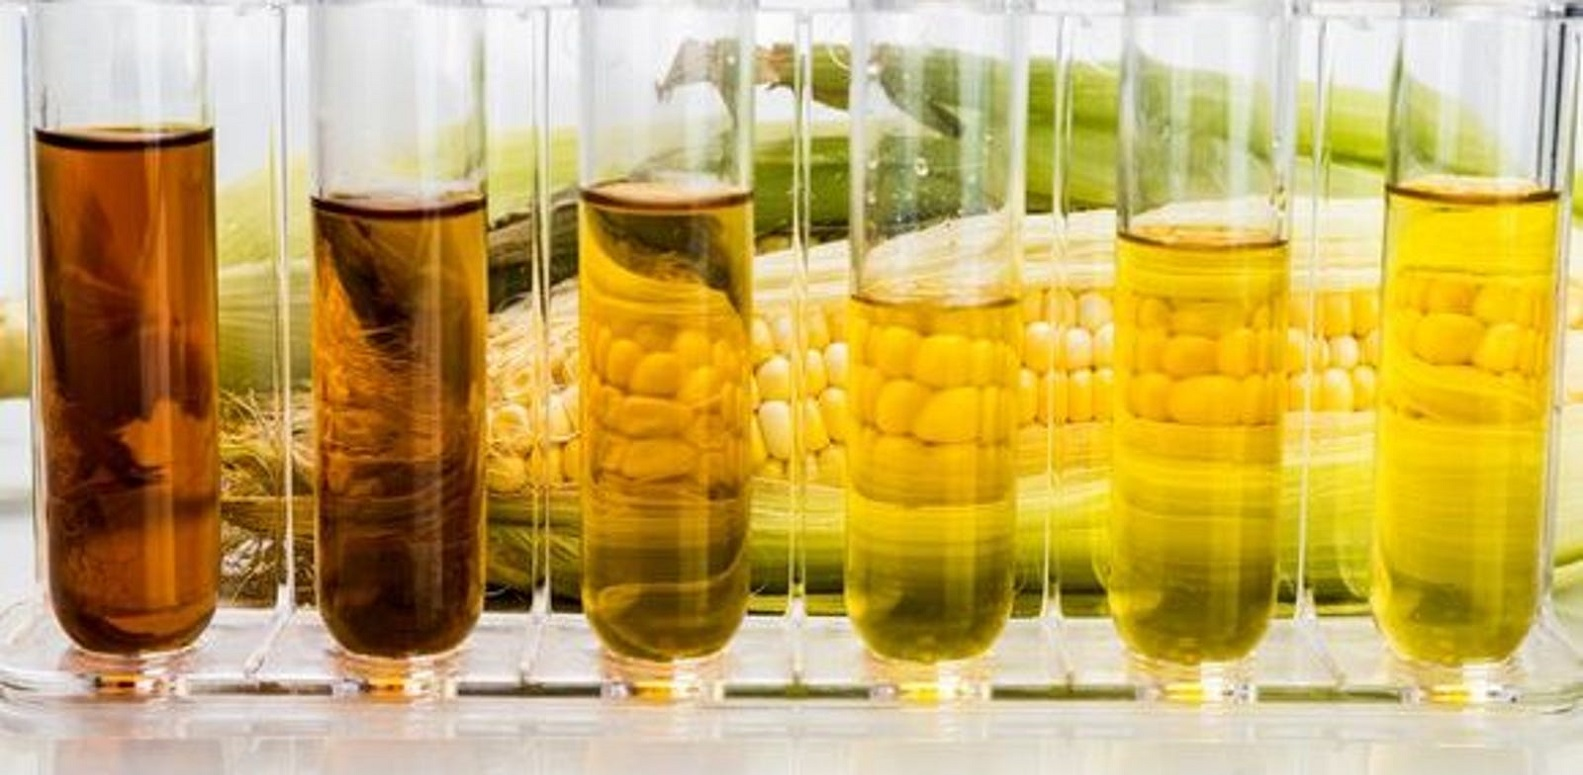 corn-ethanol (1583x775)